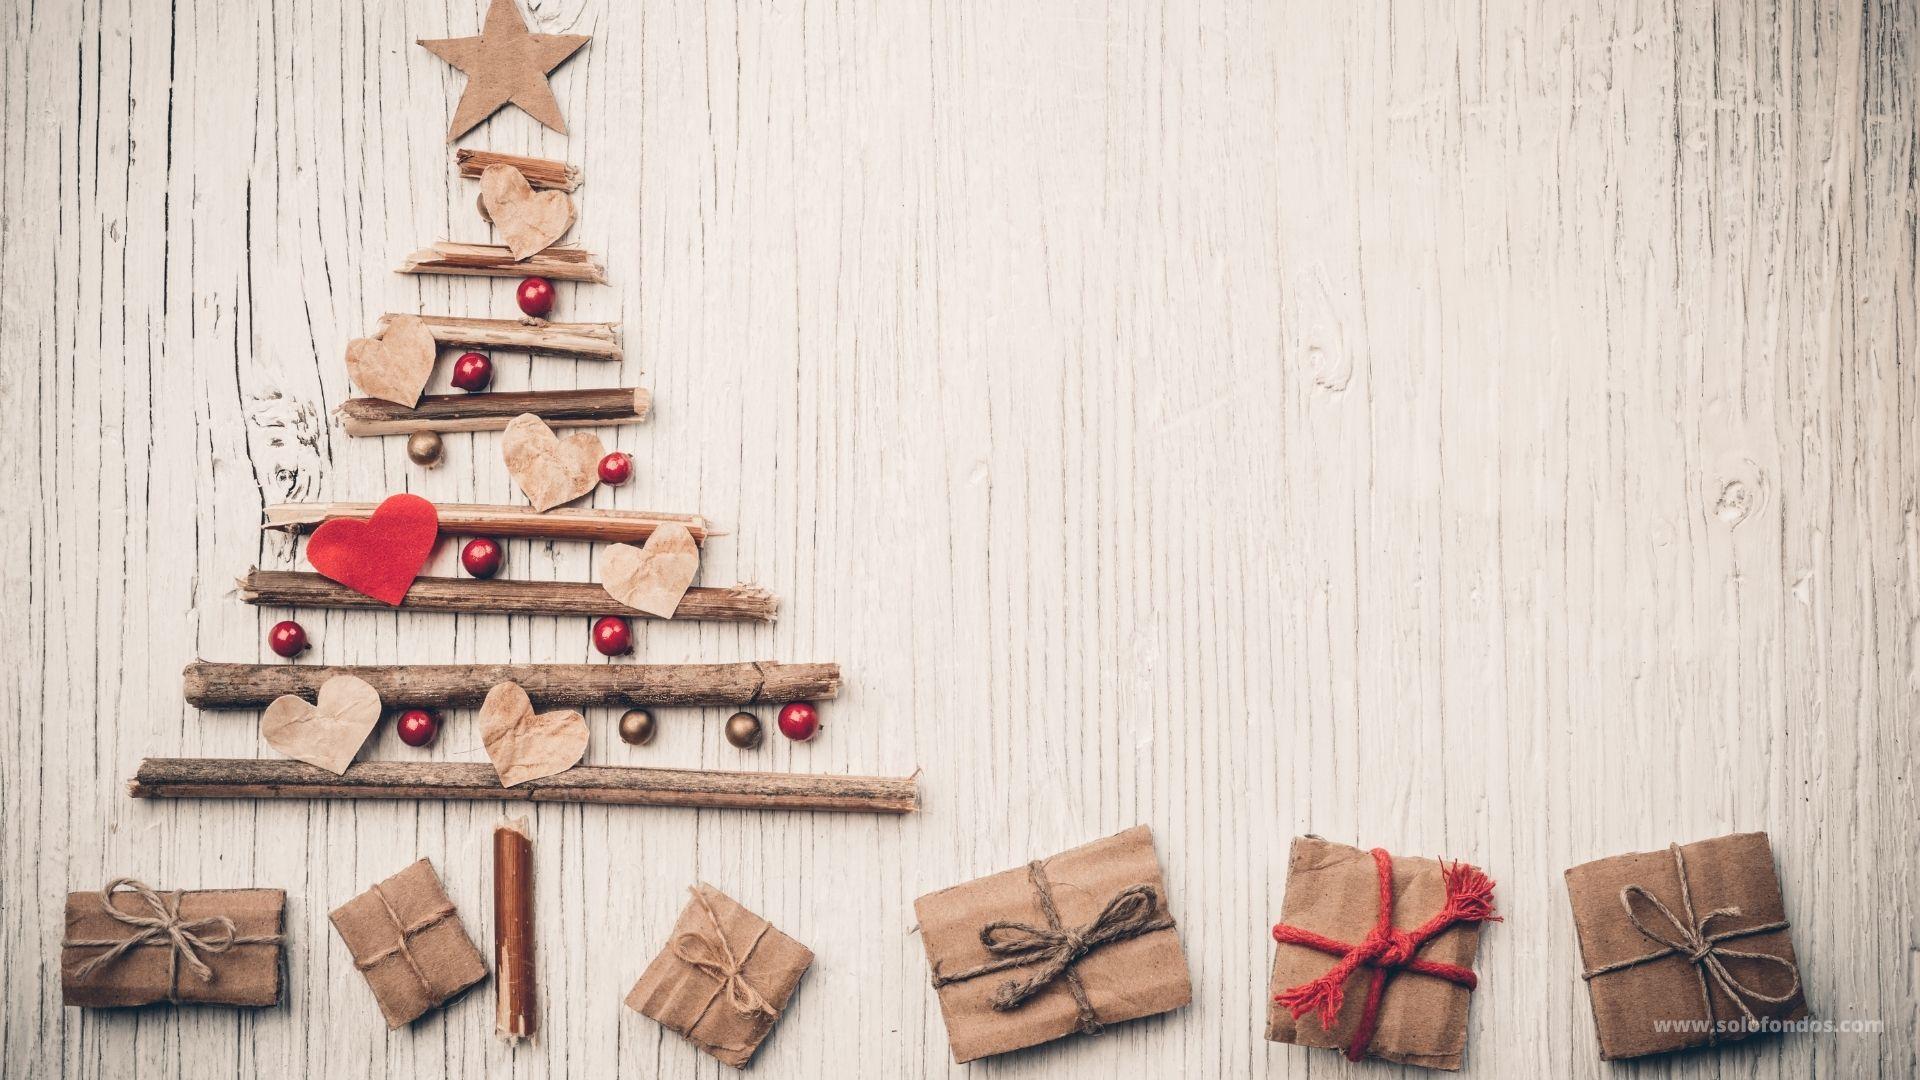 fondos de pantalla navideños con movimiento